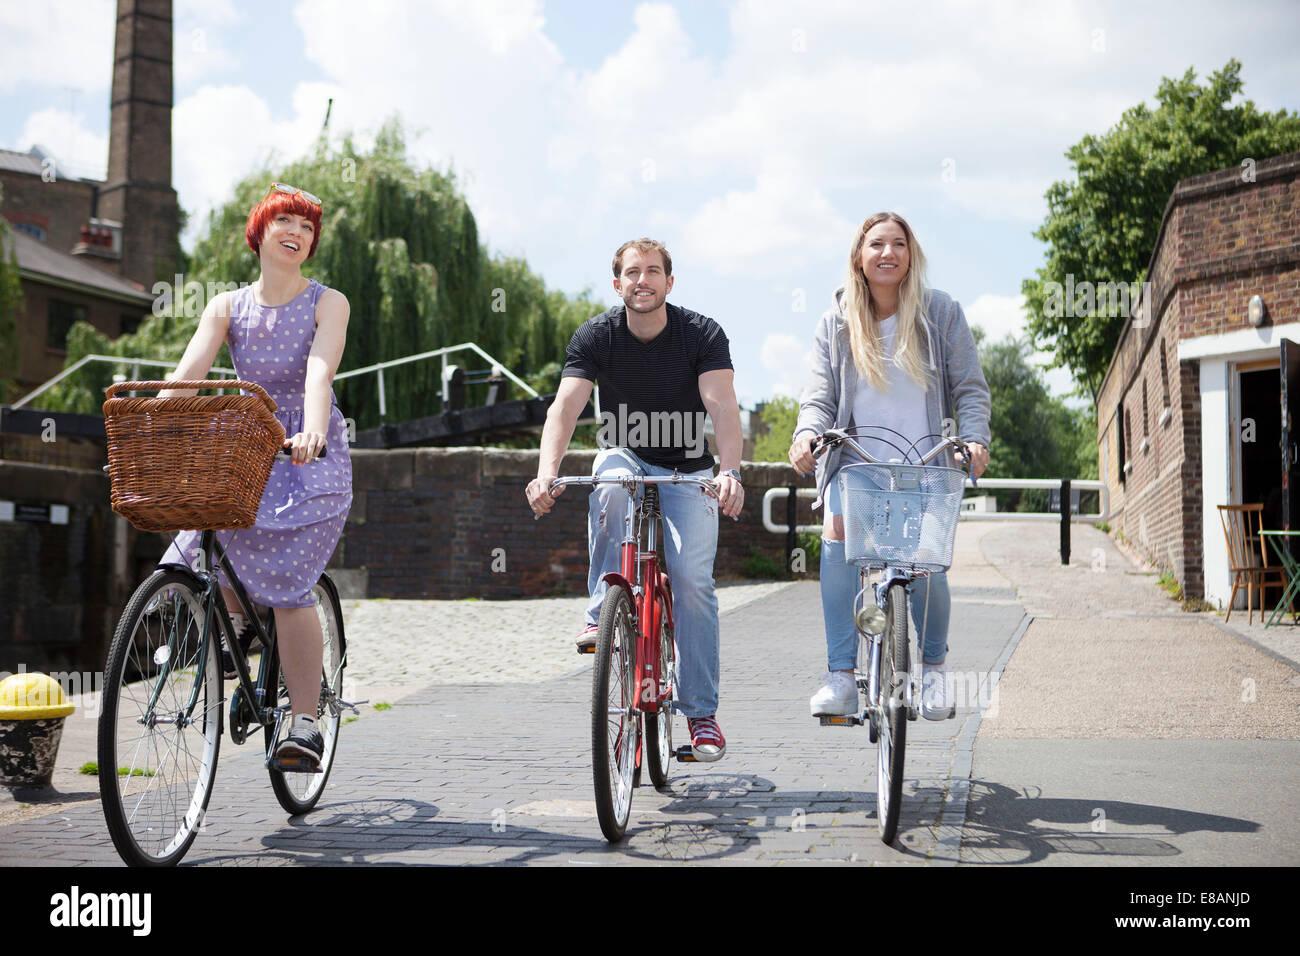 Friends riding bike along canal, East London, UK - Stock Image